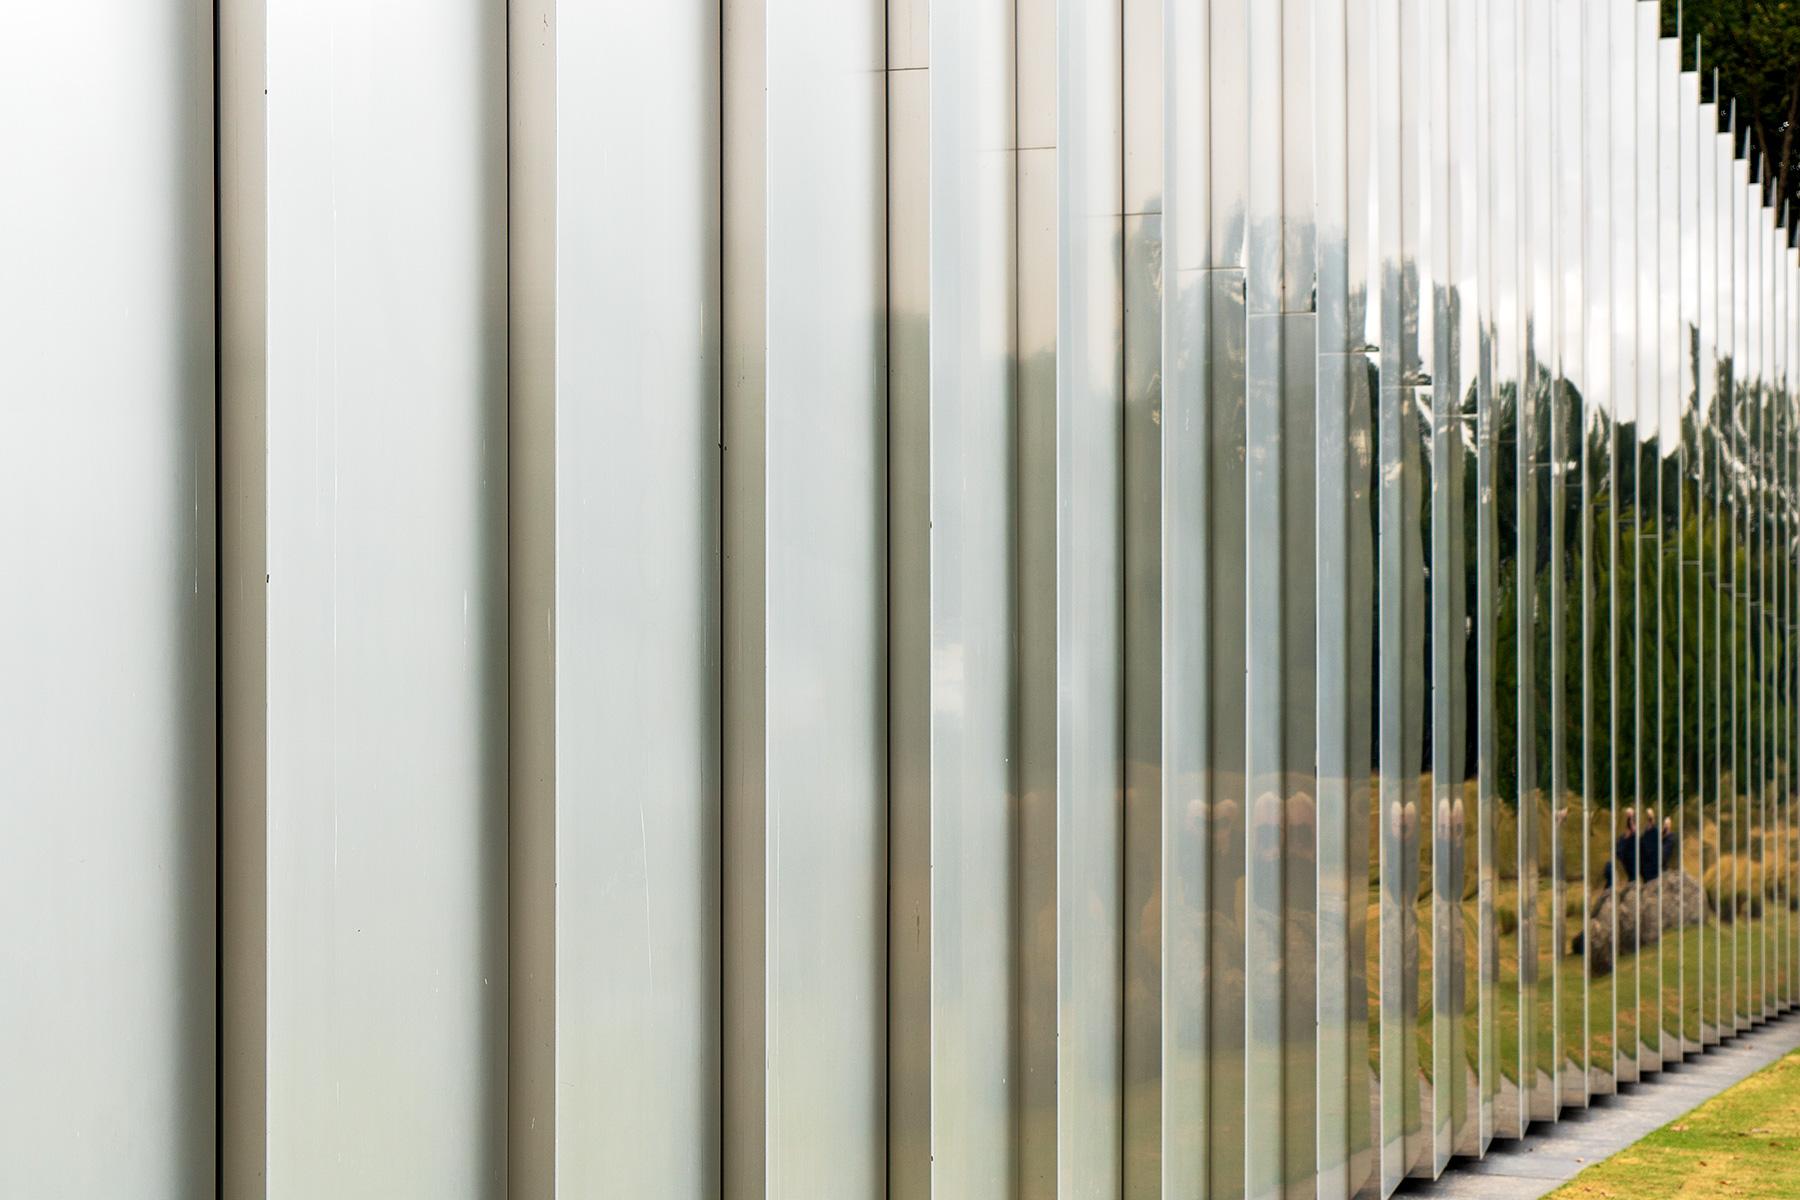 Spiegelnde Paneele am Raleigh Art Museum